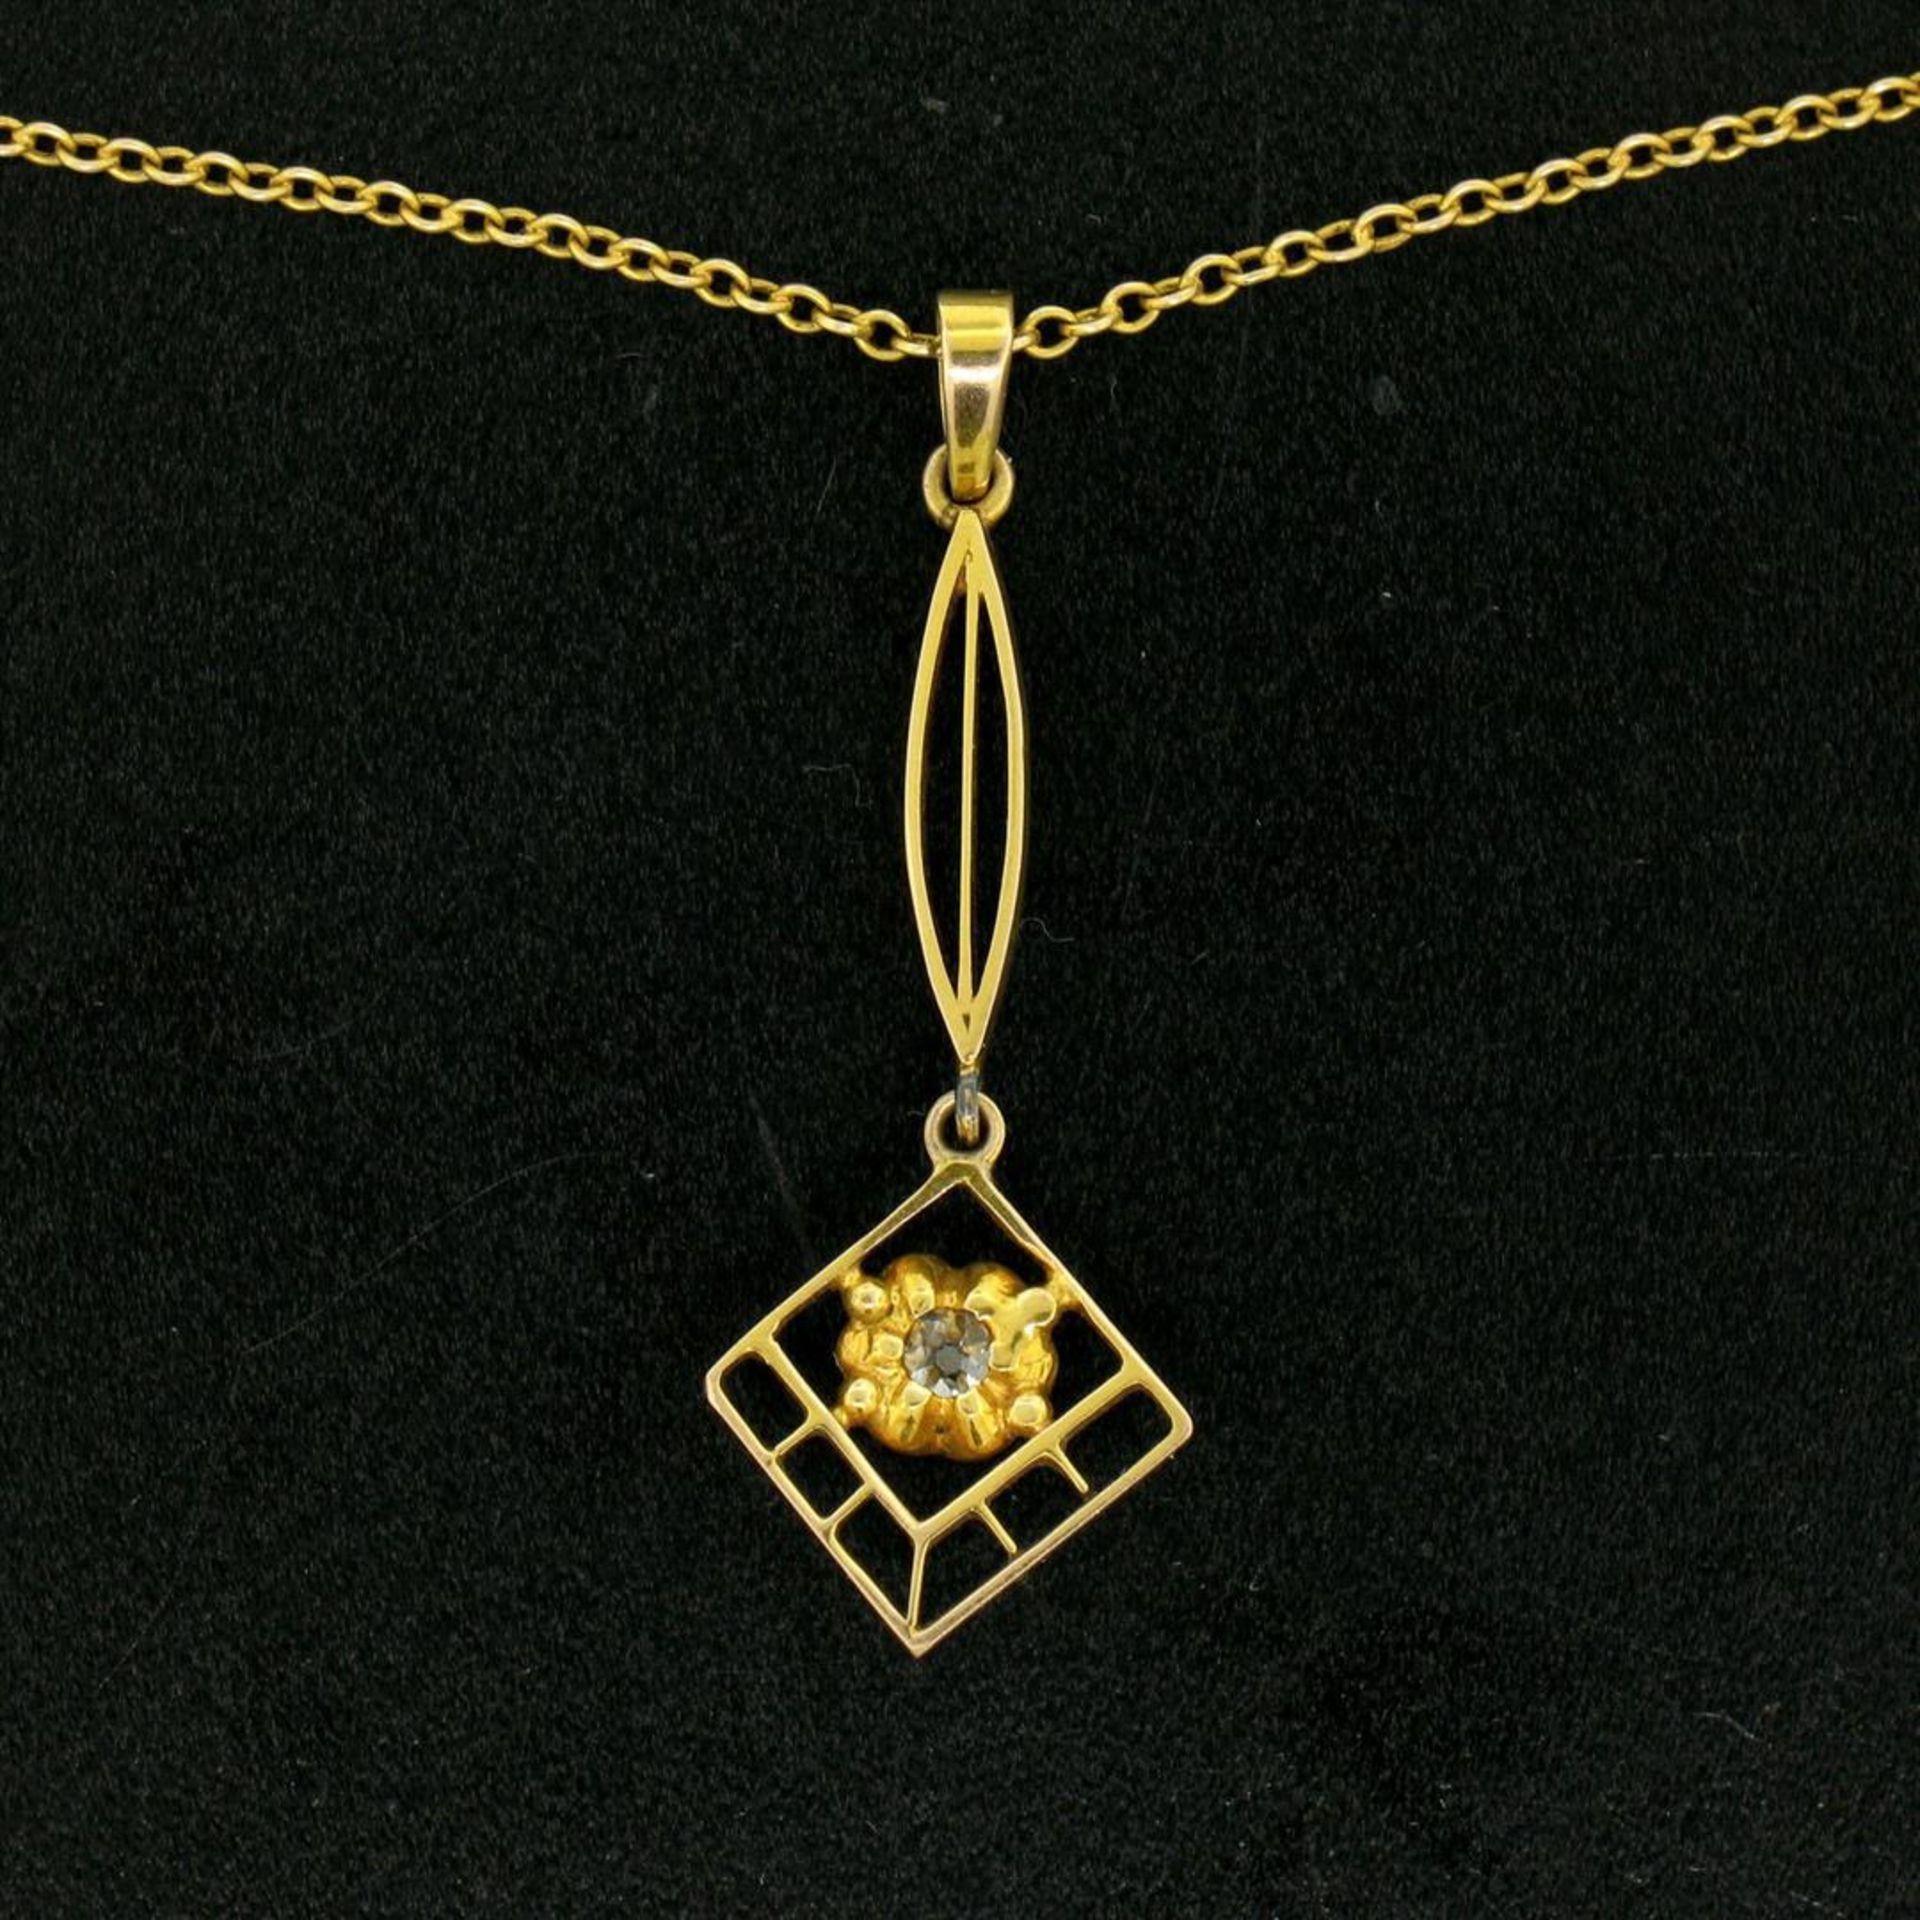 14k Gold Cushion Mine Cut Diamond Lavalier Pendant - Image 7 of 7